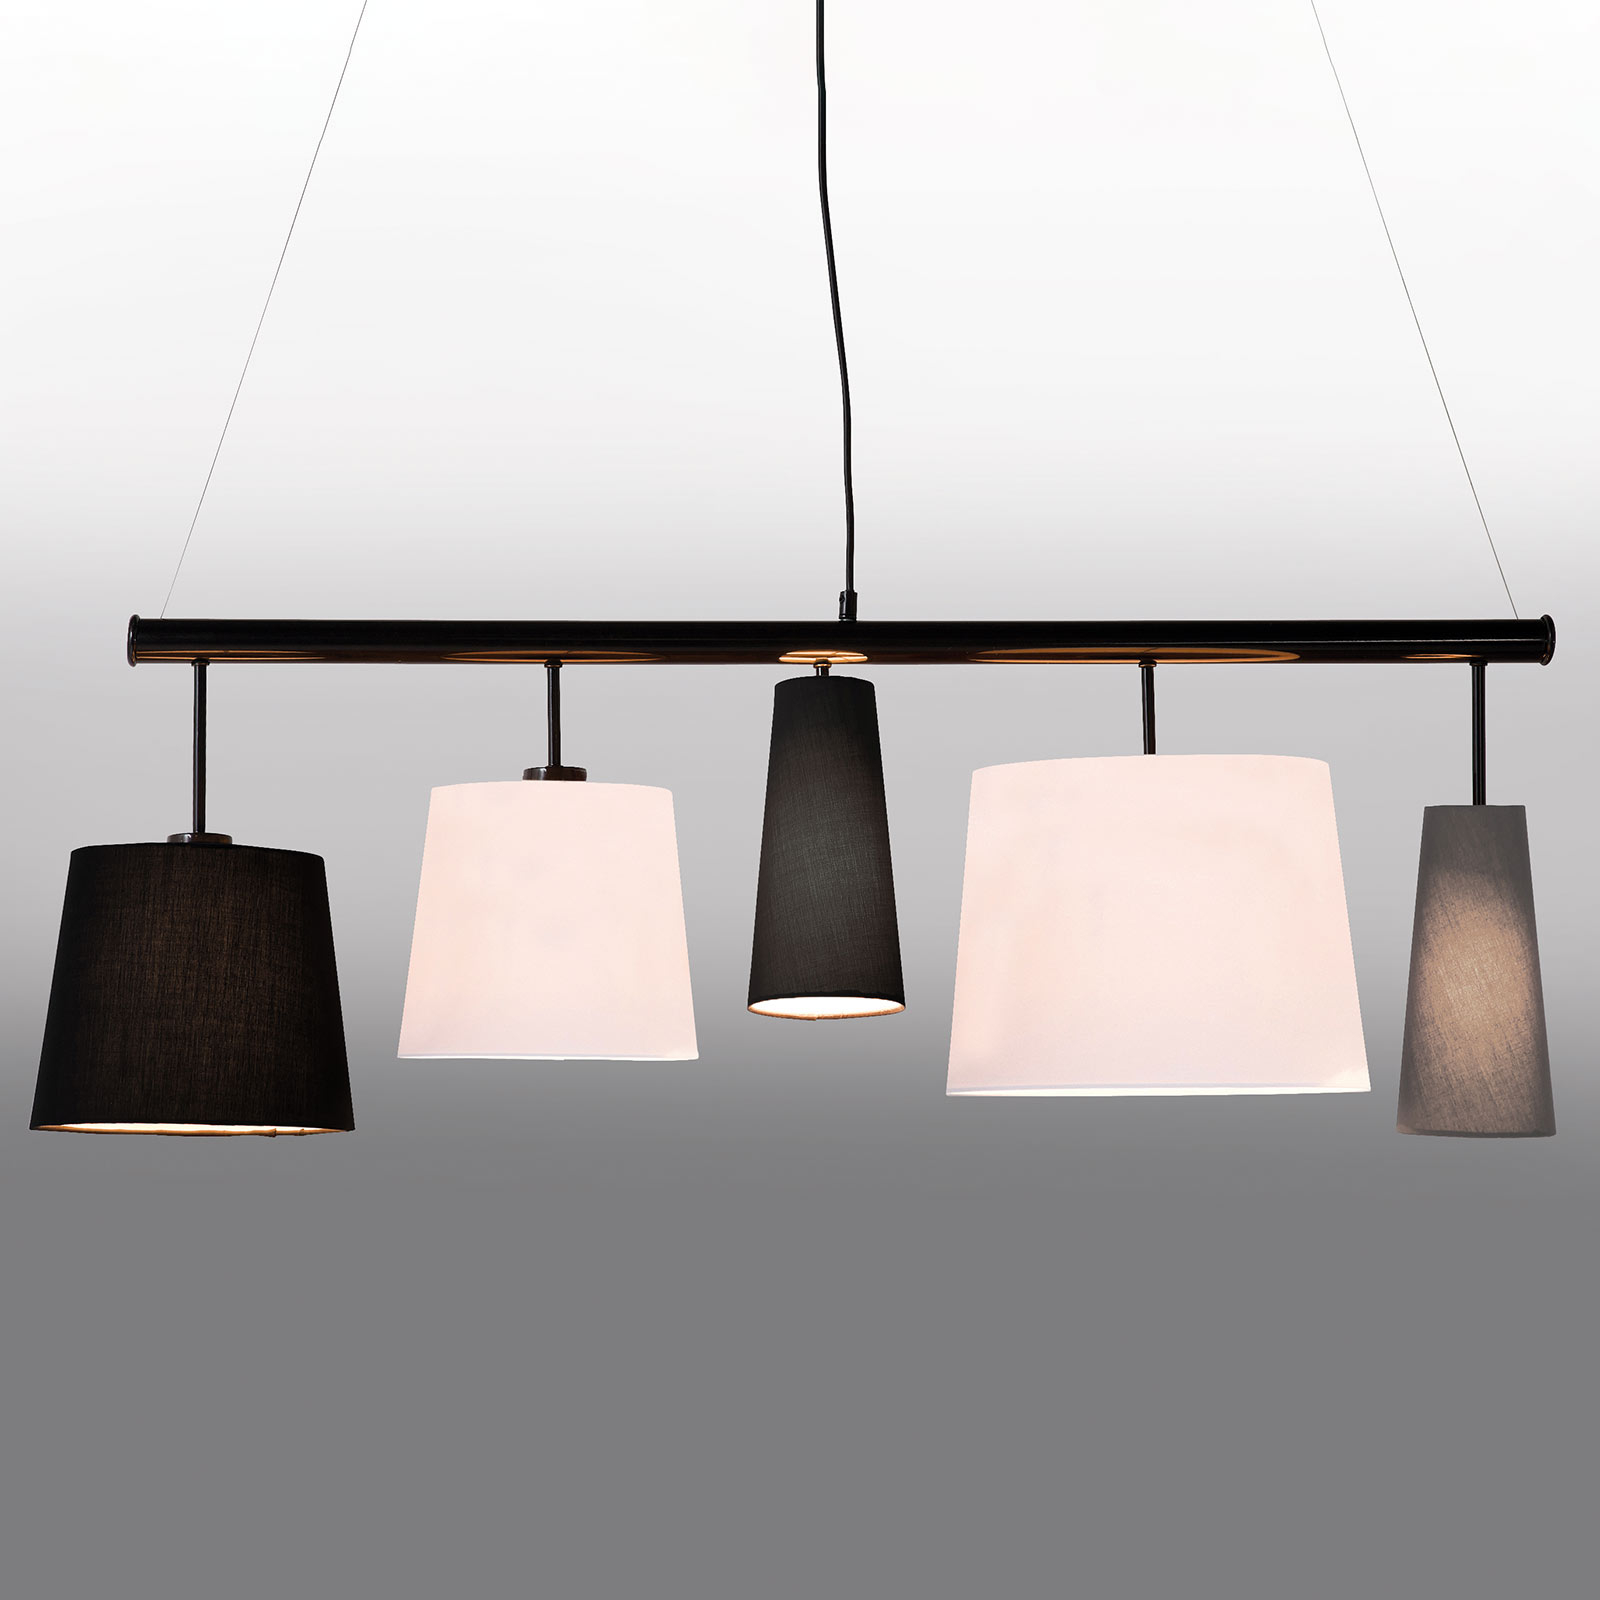 KARE Parecchi lampa wisząca, 100 cm, czarna